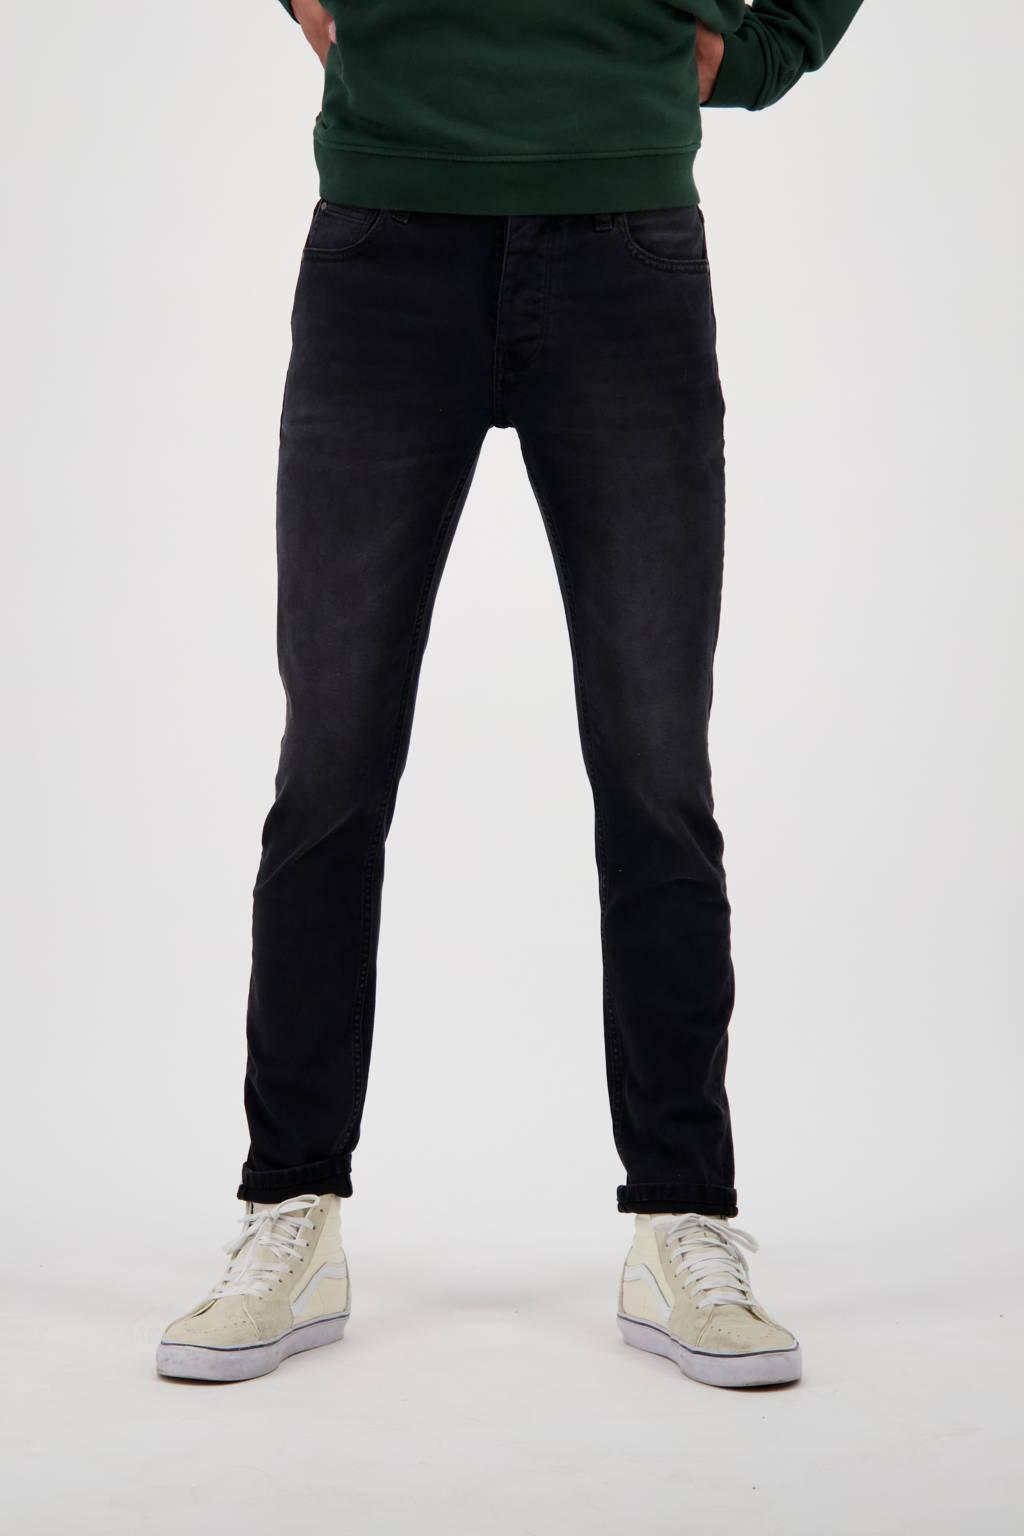 Raizzed skinny fit jeans Desert black stone, 05/32 Black Stone 32